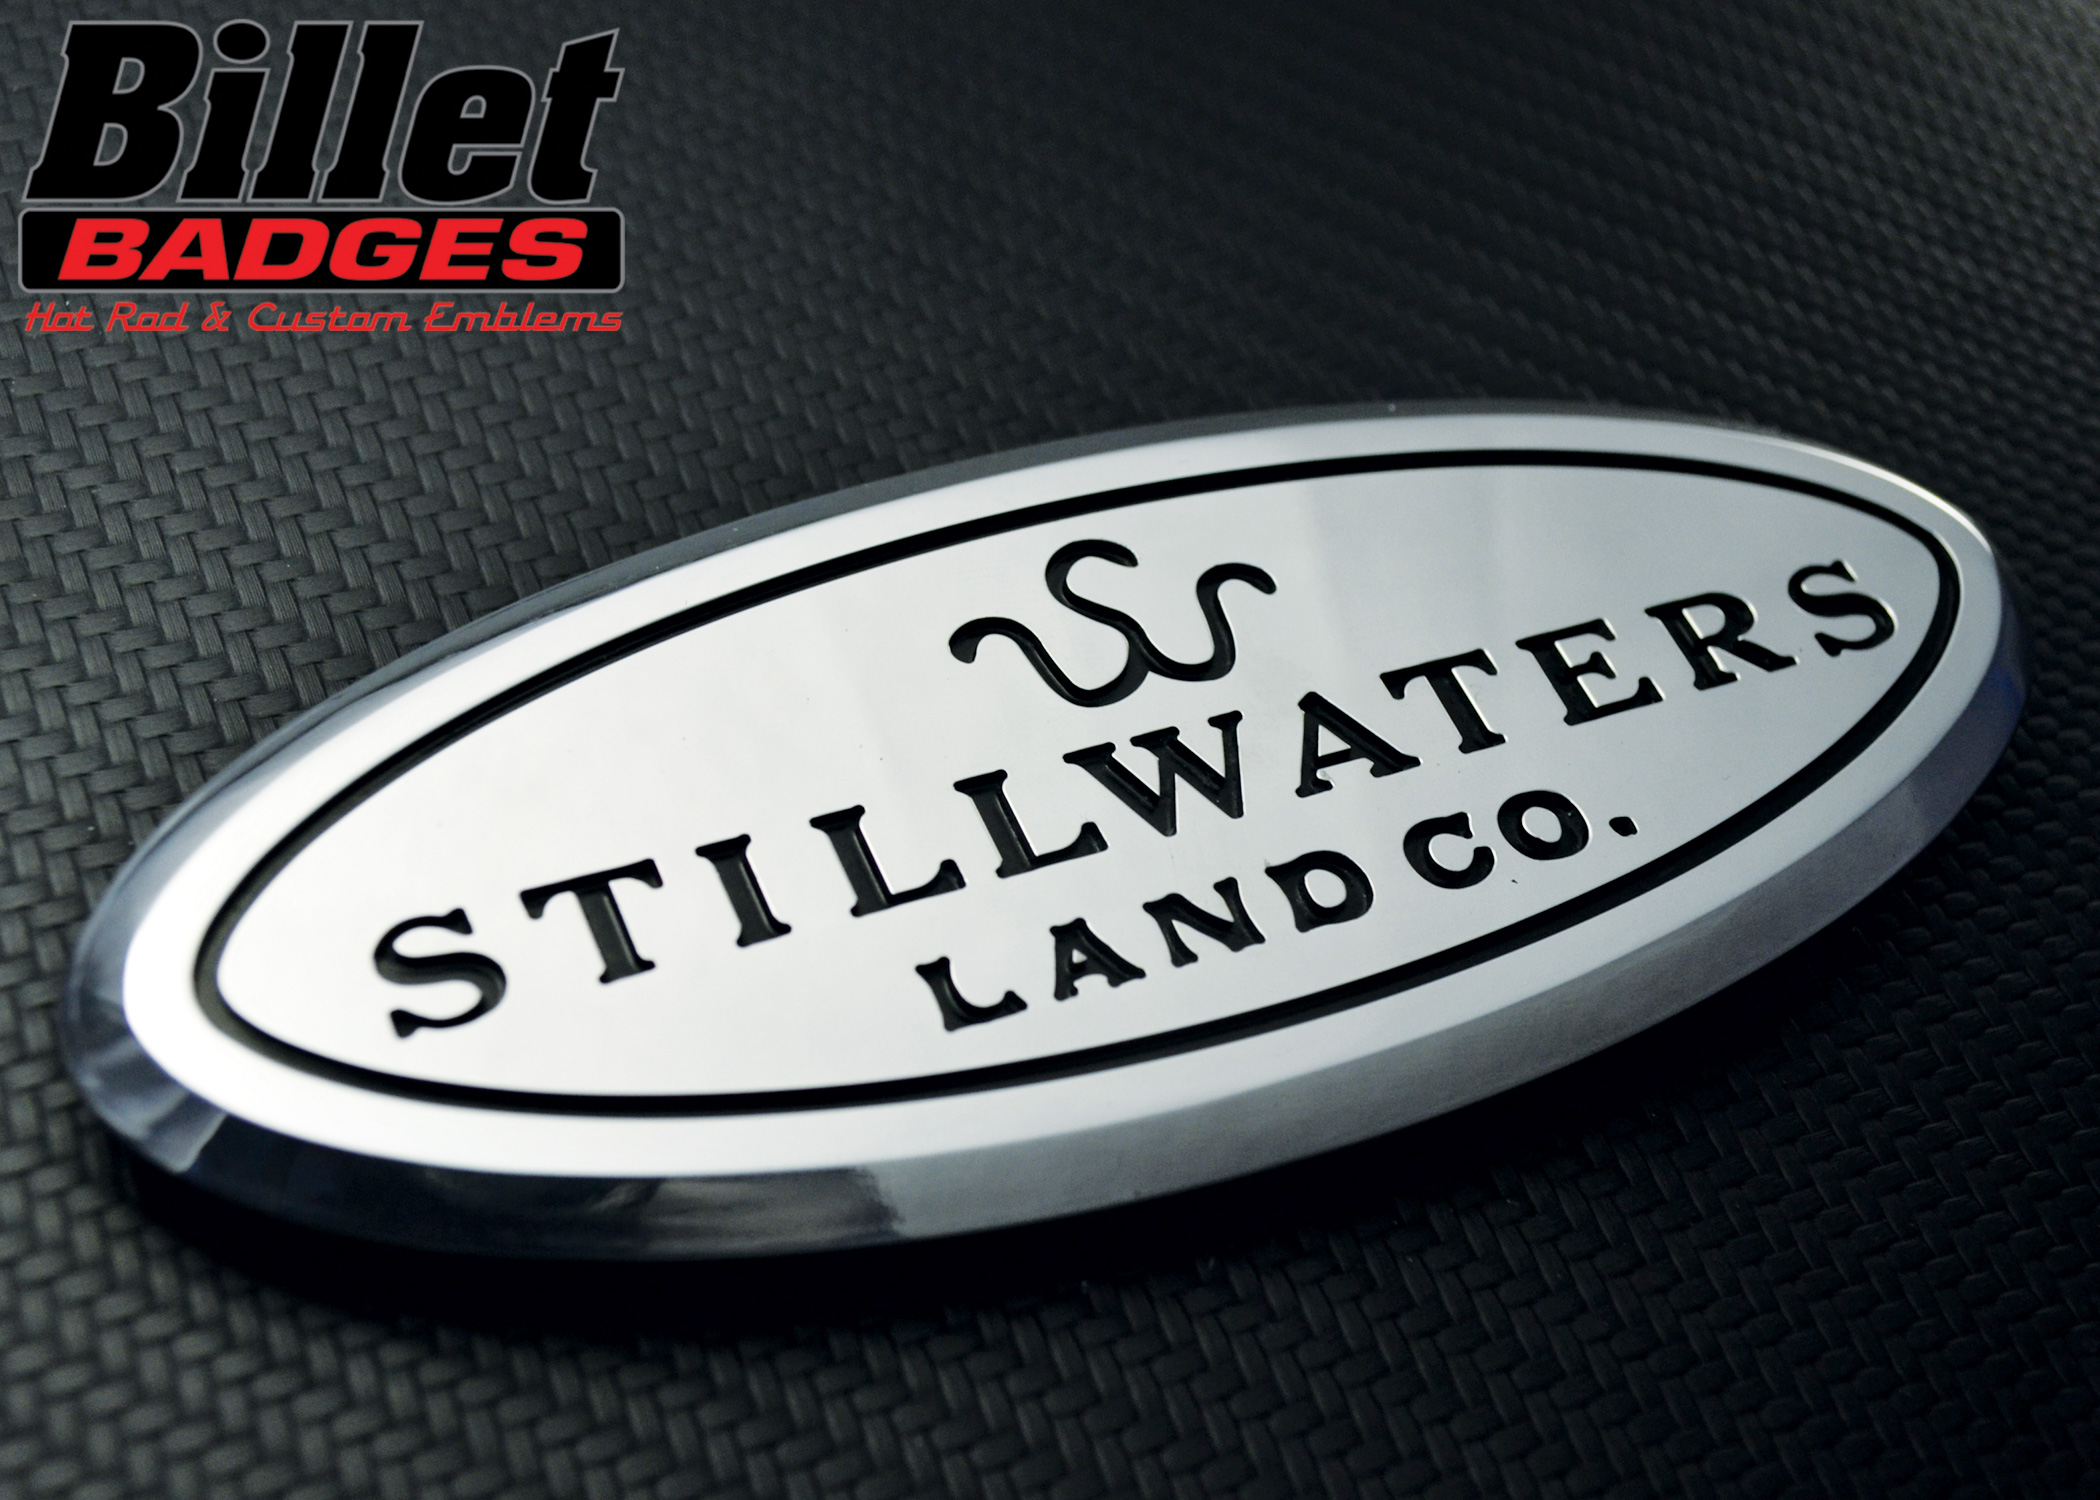 Stillwaters Logo